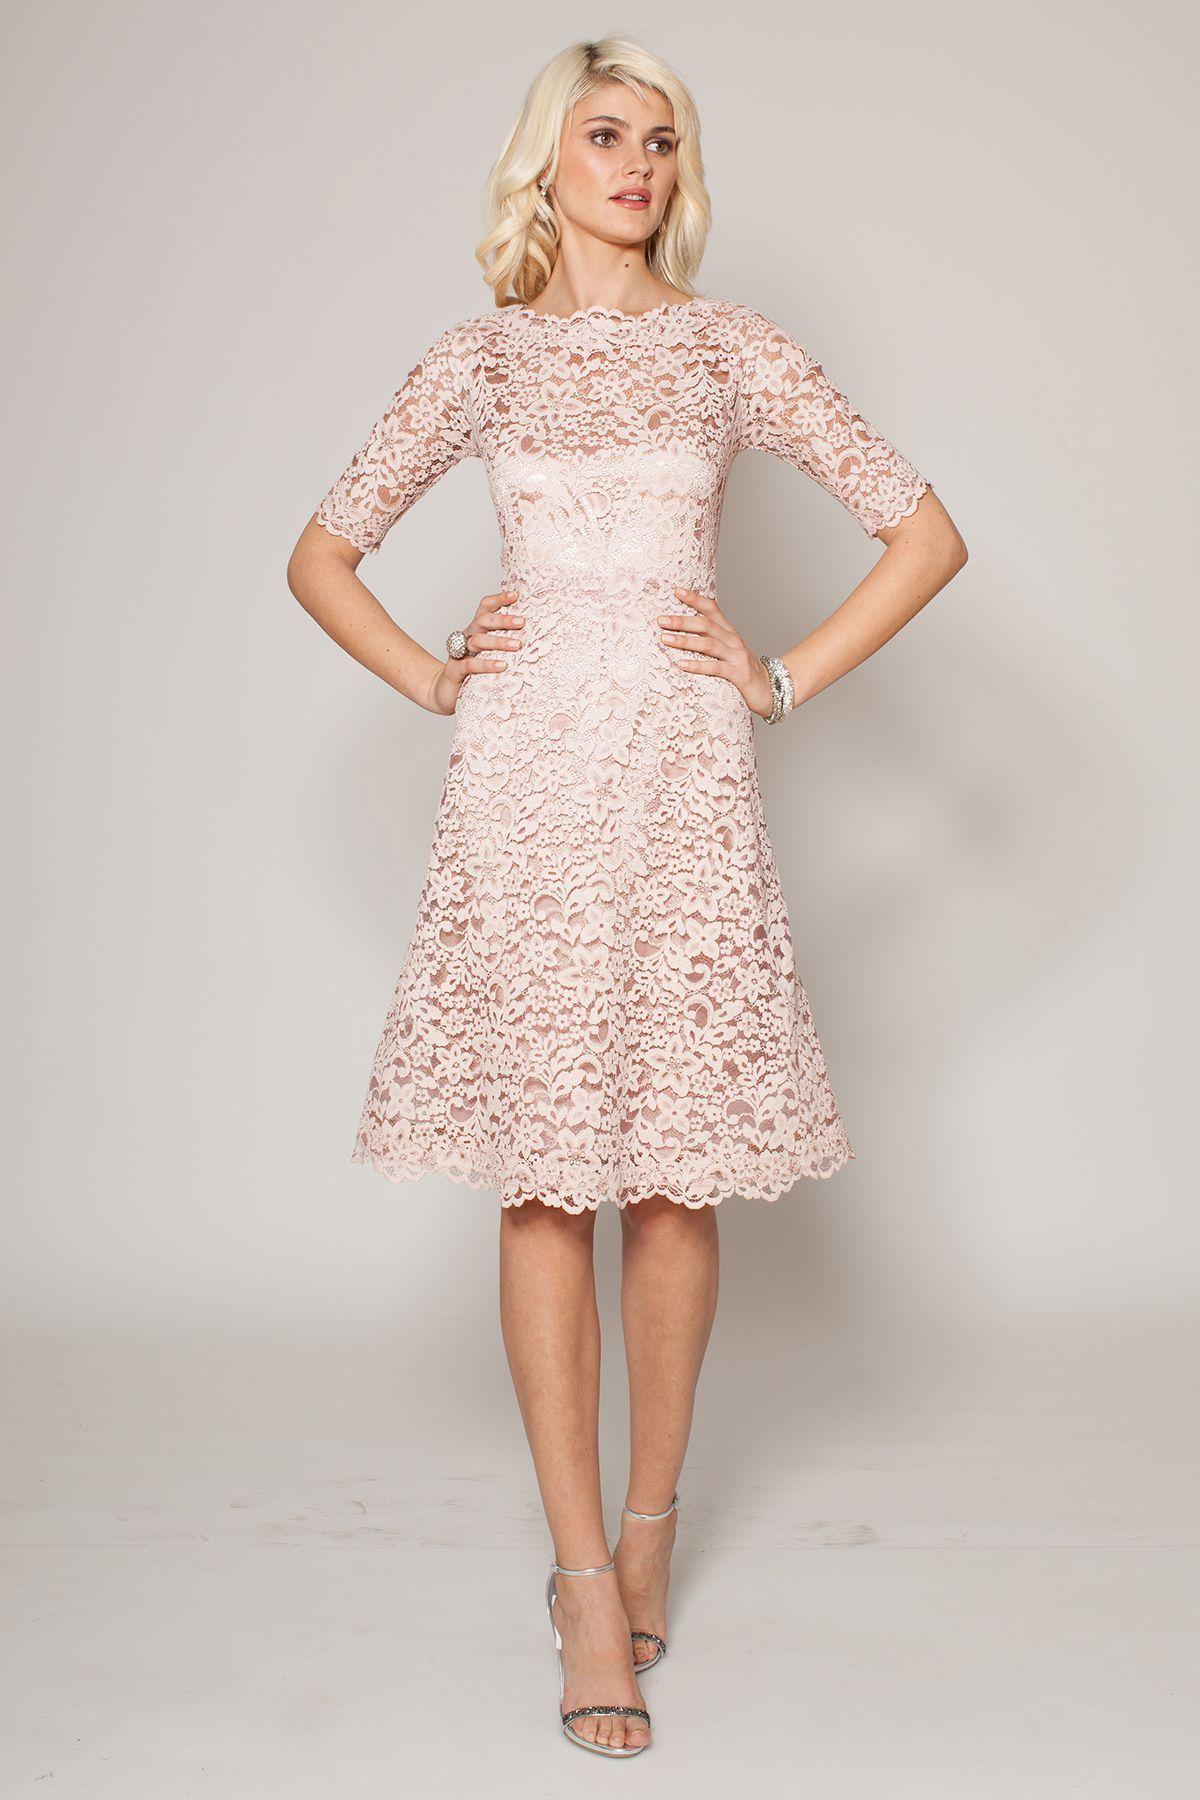 Dusty rose bridesmaid dresses that looks wonderful dusty rose lace dusty rose bridesmaid dresses that looks wonderful dusty rose lace bridesmaid dresses ombrellifo Choice Image